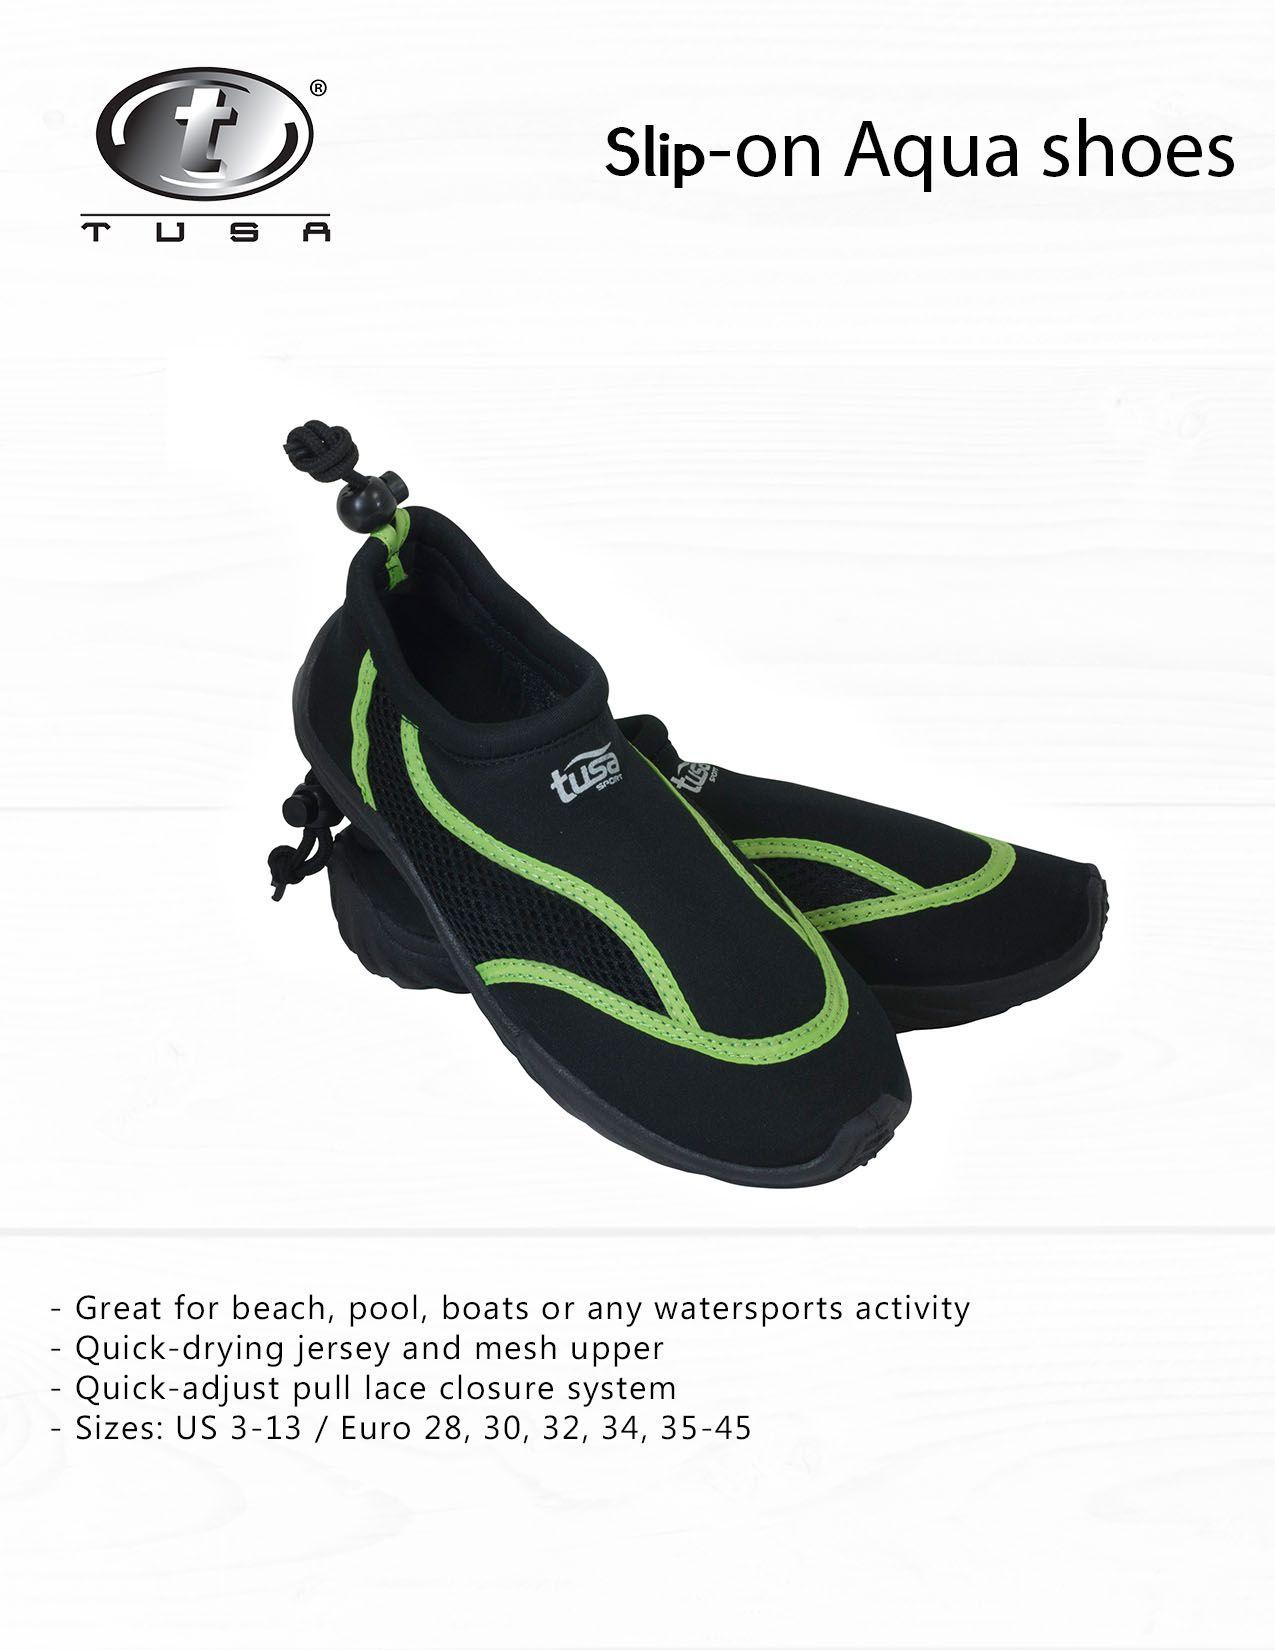 27a8549c35d7 The TUSA Sport UA0101 slip on show is a lightweight